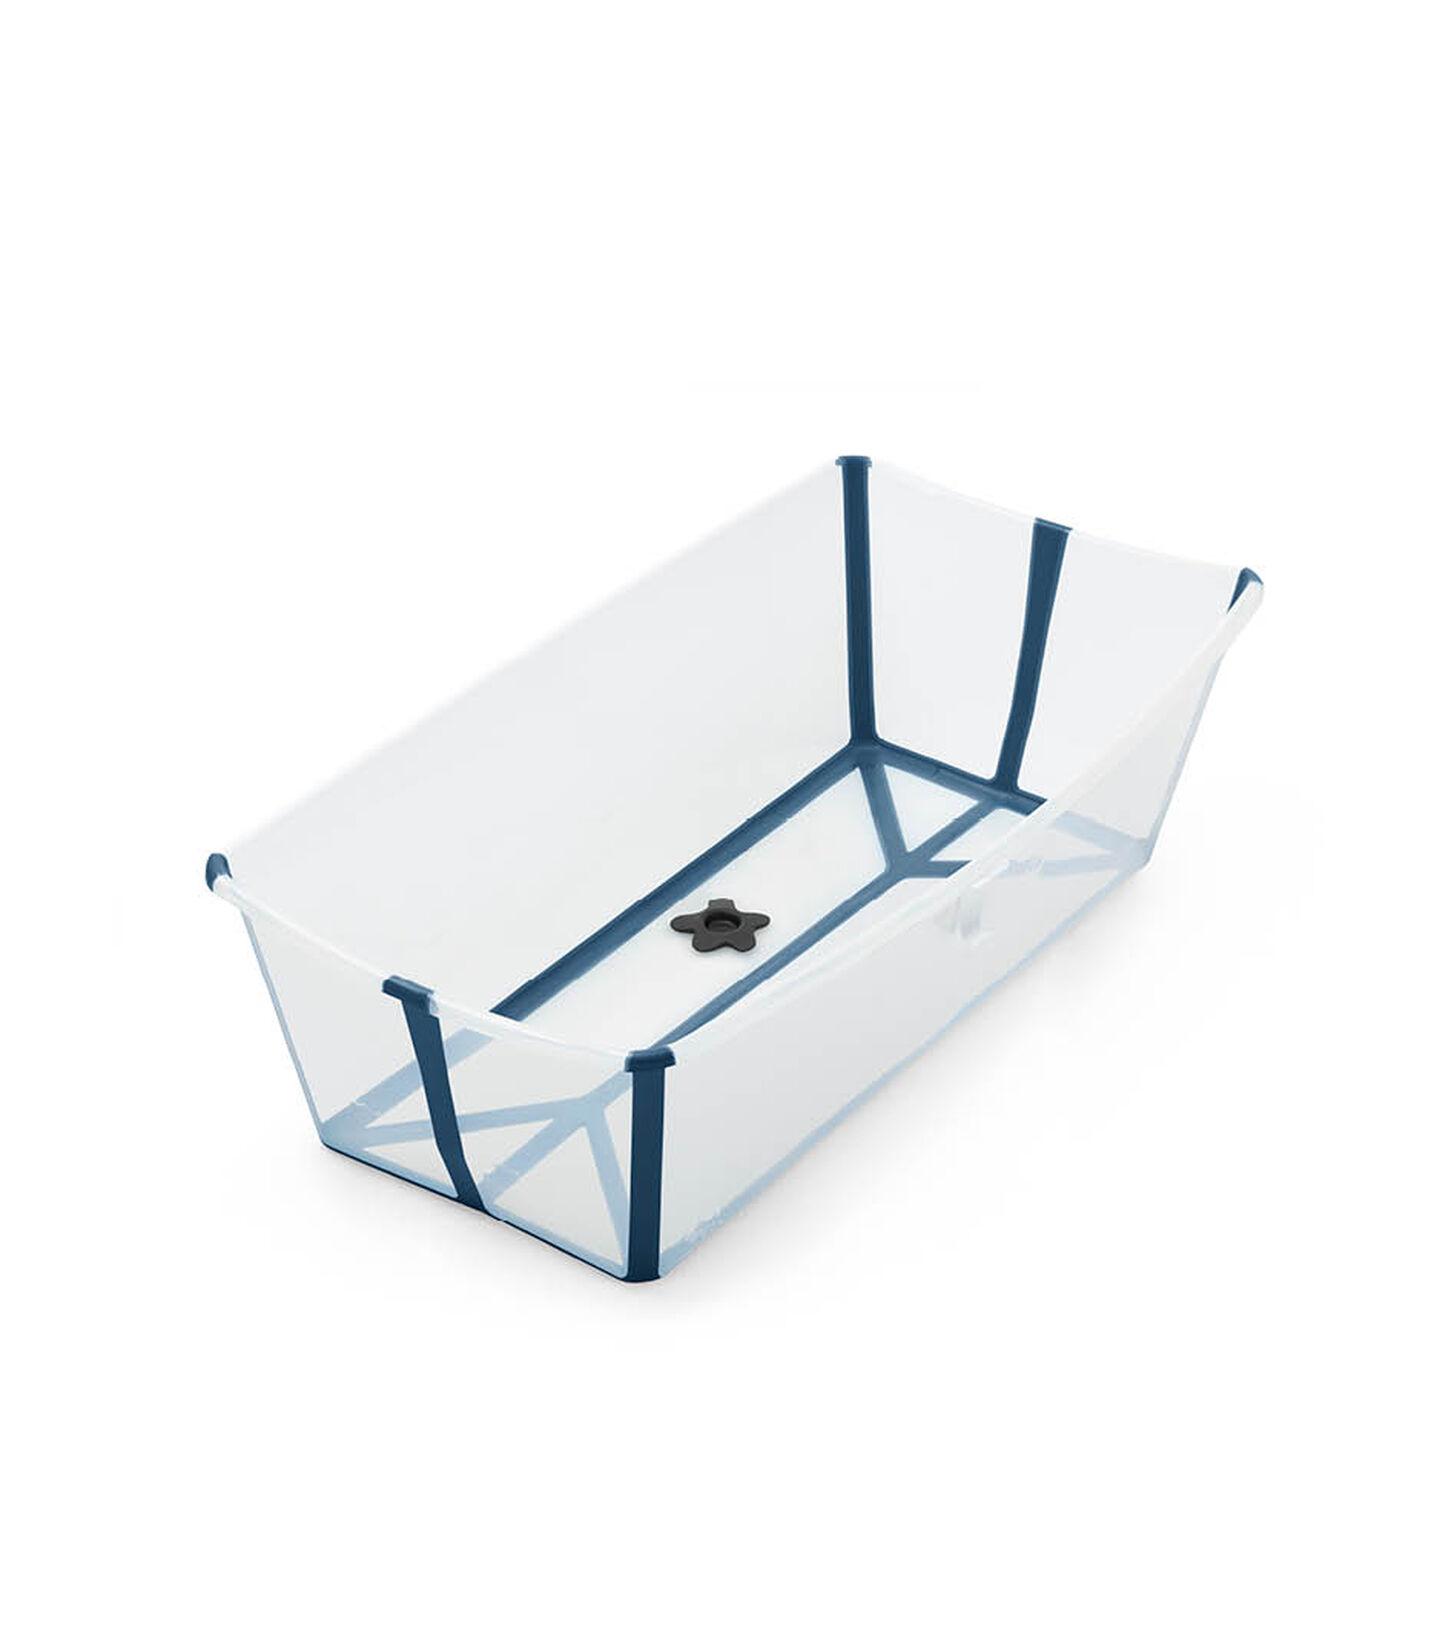 Stokke® Flexi Bath® XL bath tub, Transparent Blue. view 2